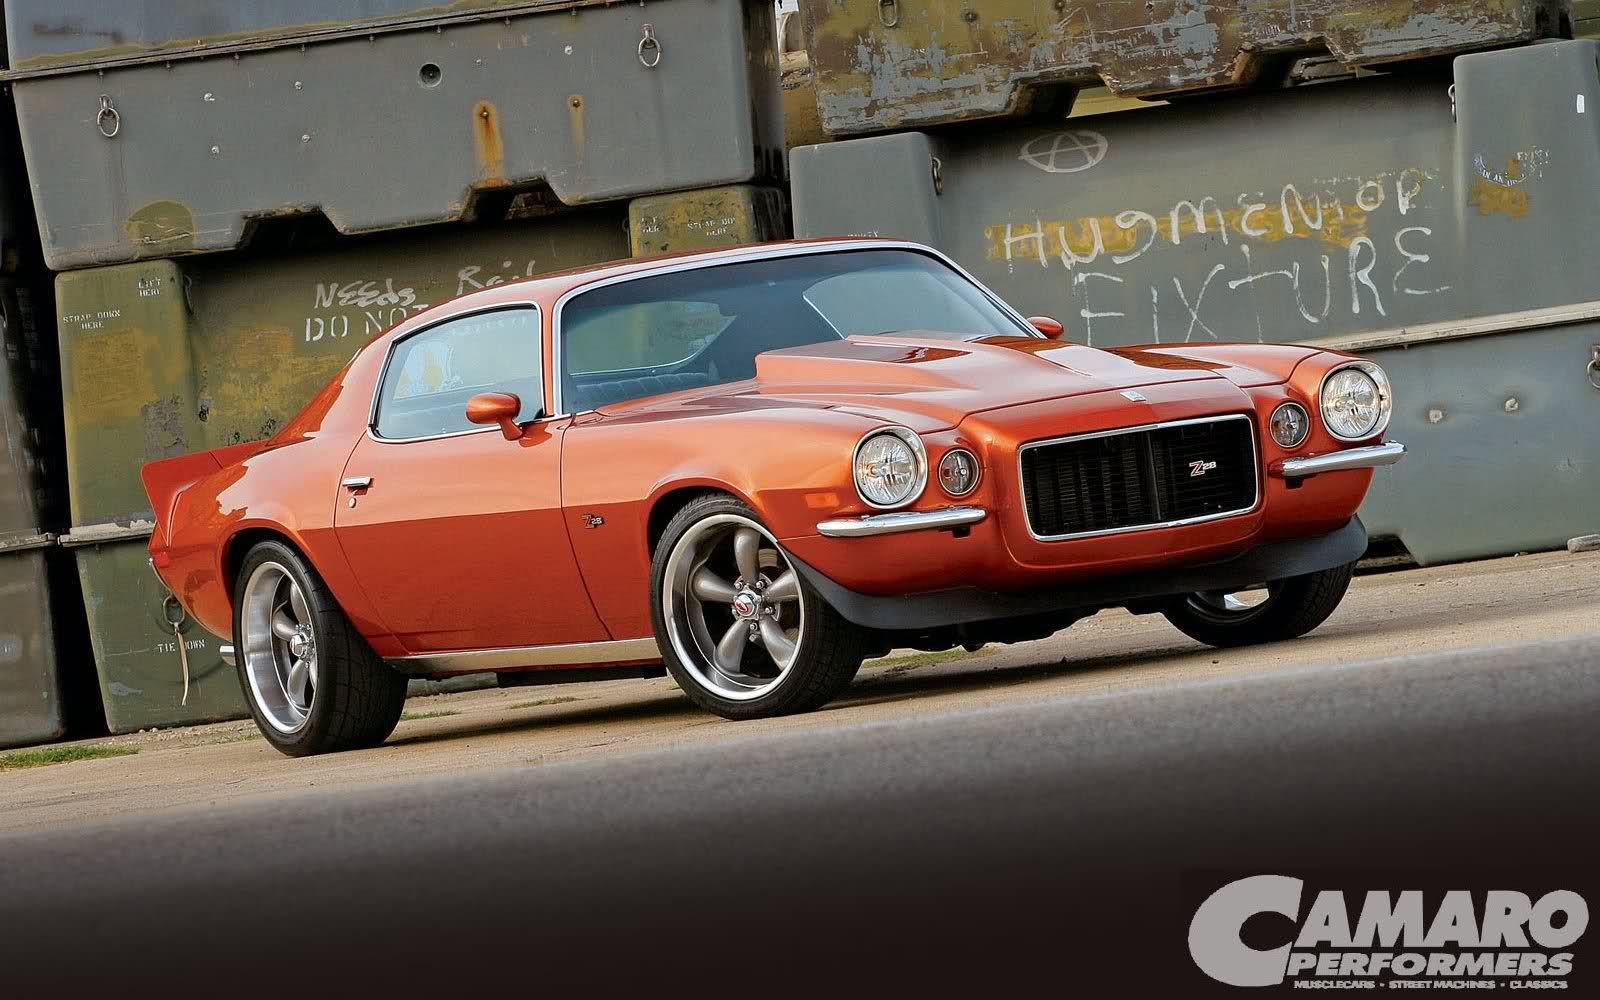 70 Camaro iPhone Wallpaper - image #544 | Cars | Pinterest | Chevy ...